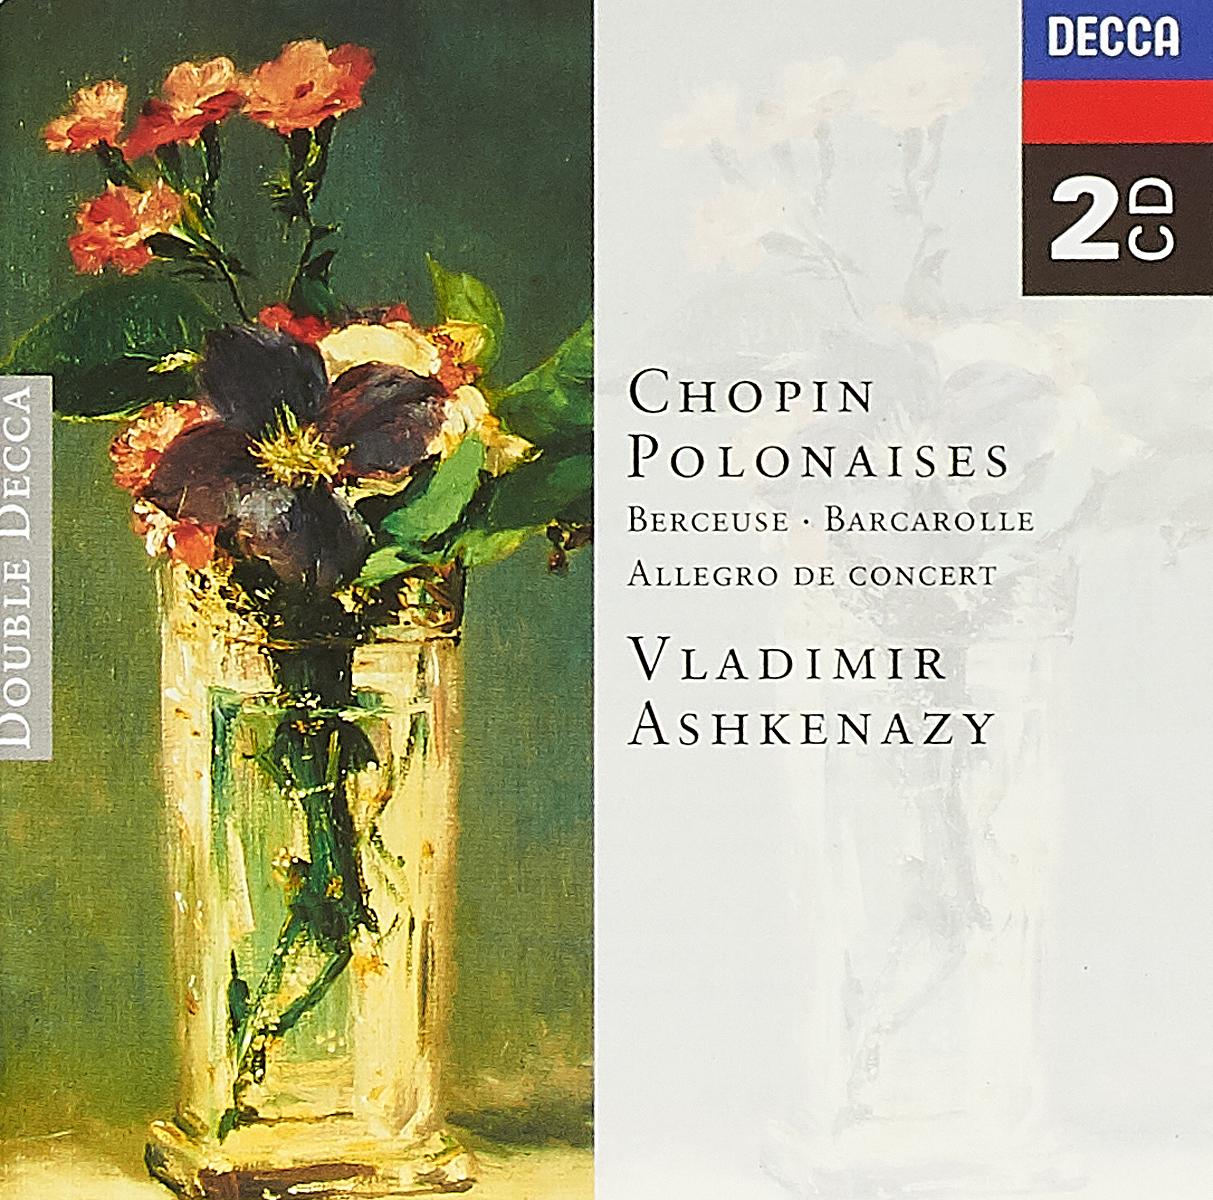 Владимир Ашкенази Vladimir Ashkenazy. Chopin: Polonaises (2 CD) yulianna avdeeva chopin schubert prokofiev 2 cd